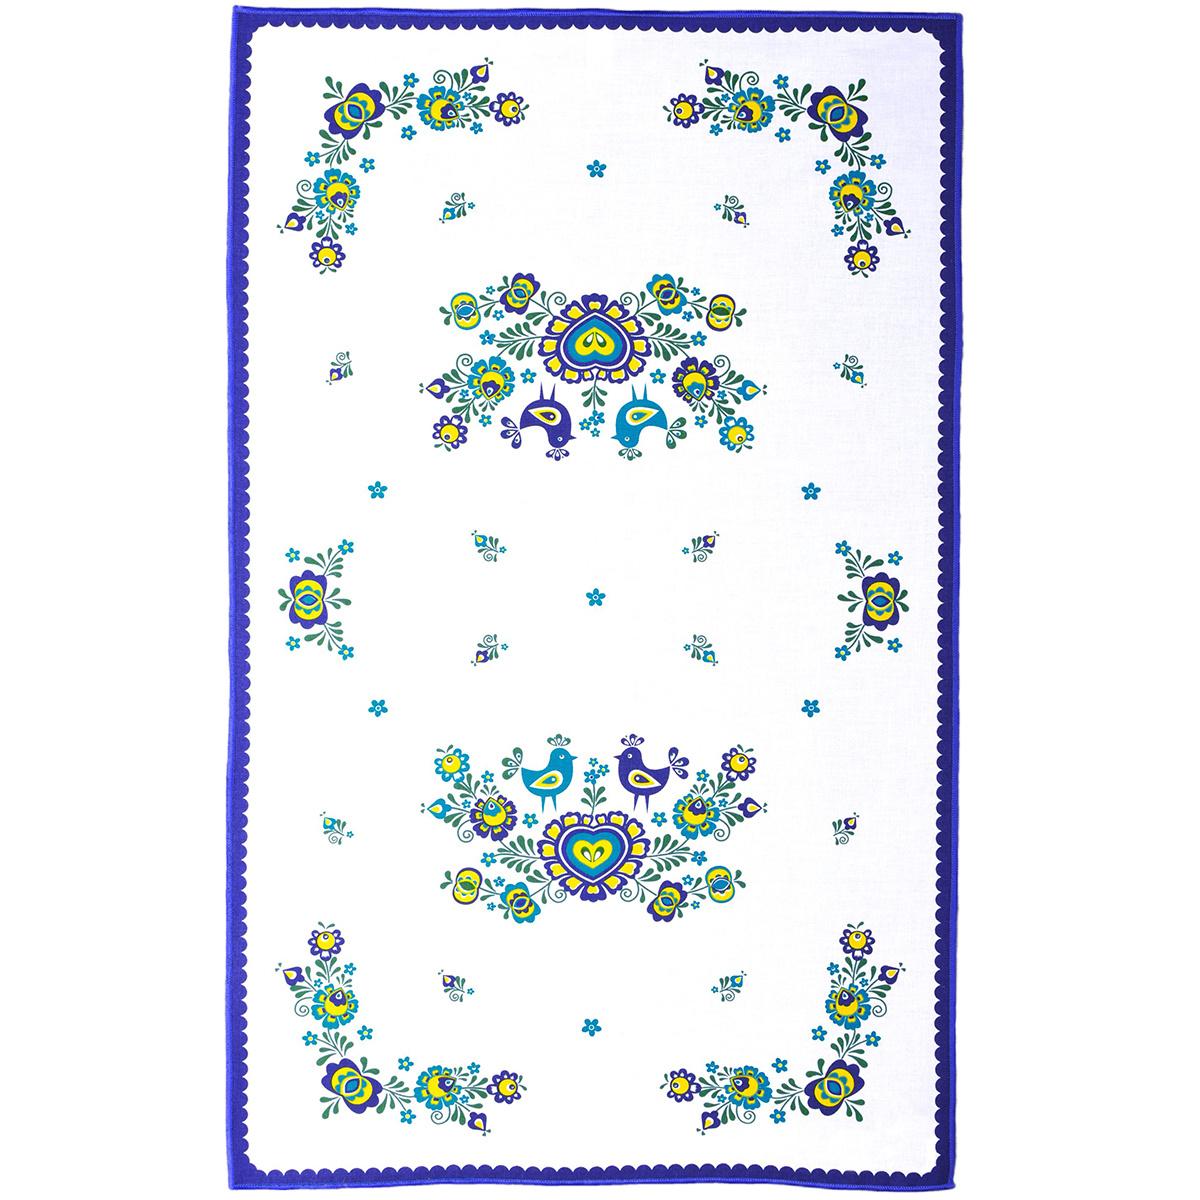 FORBYT Utěrka Folklor modrá, 45 x 70 cm